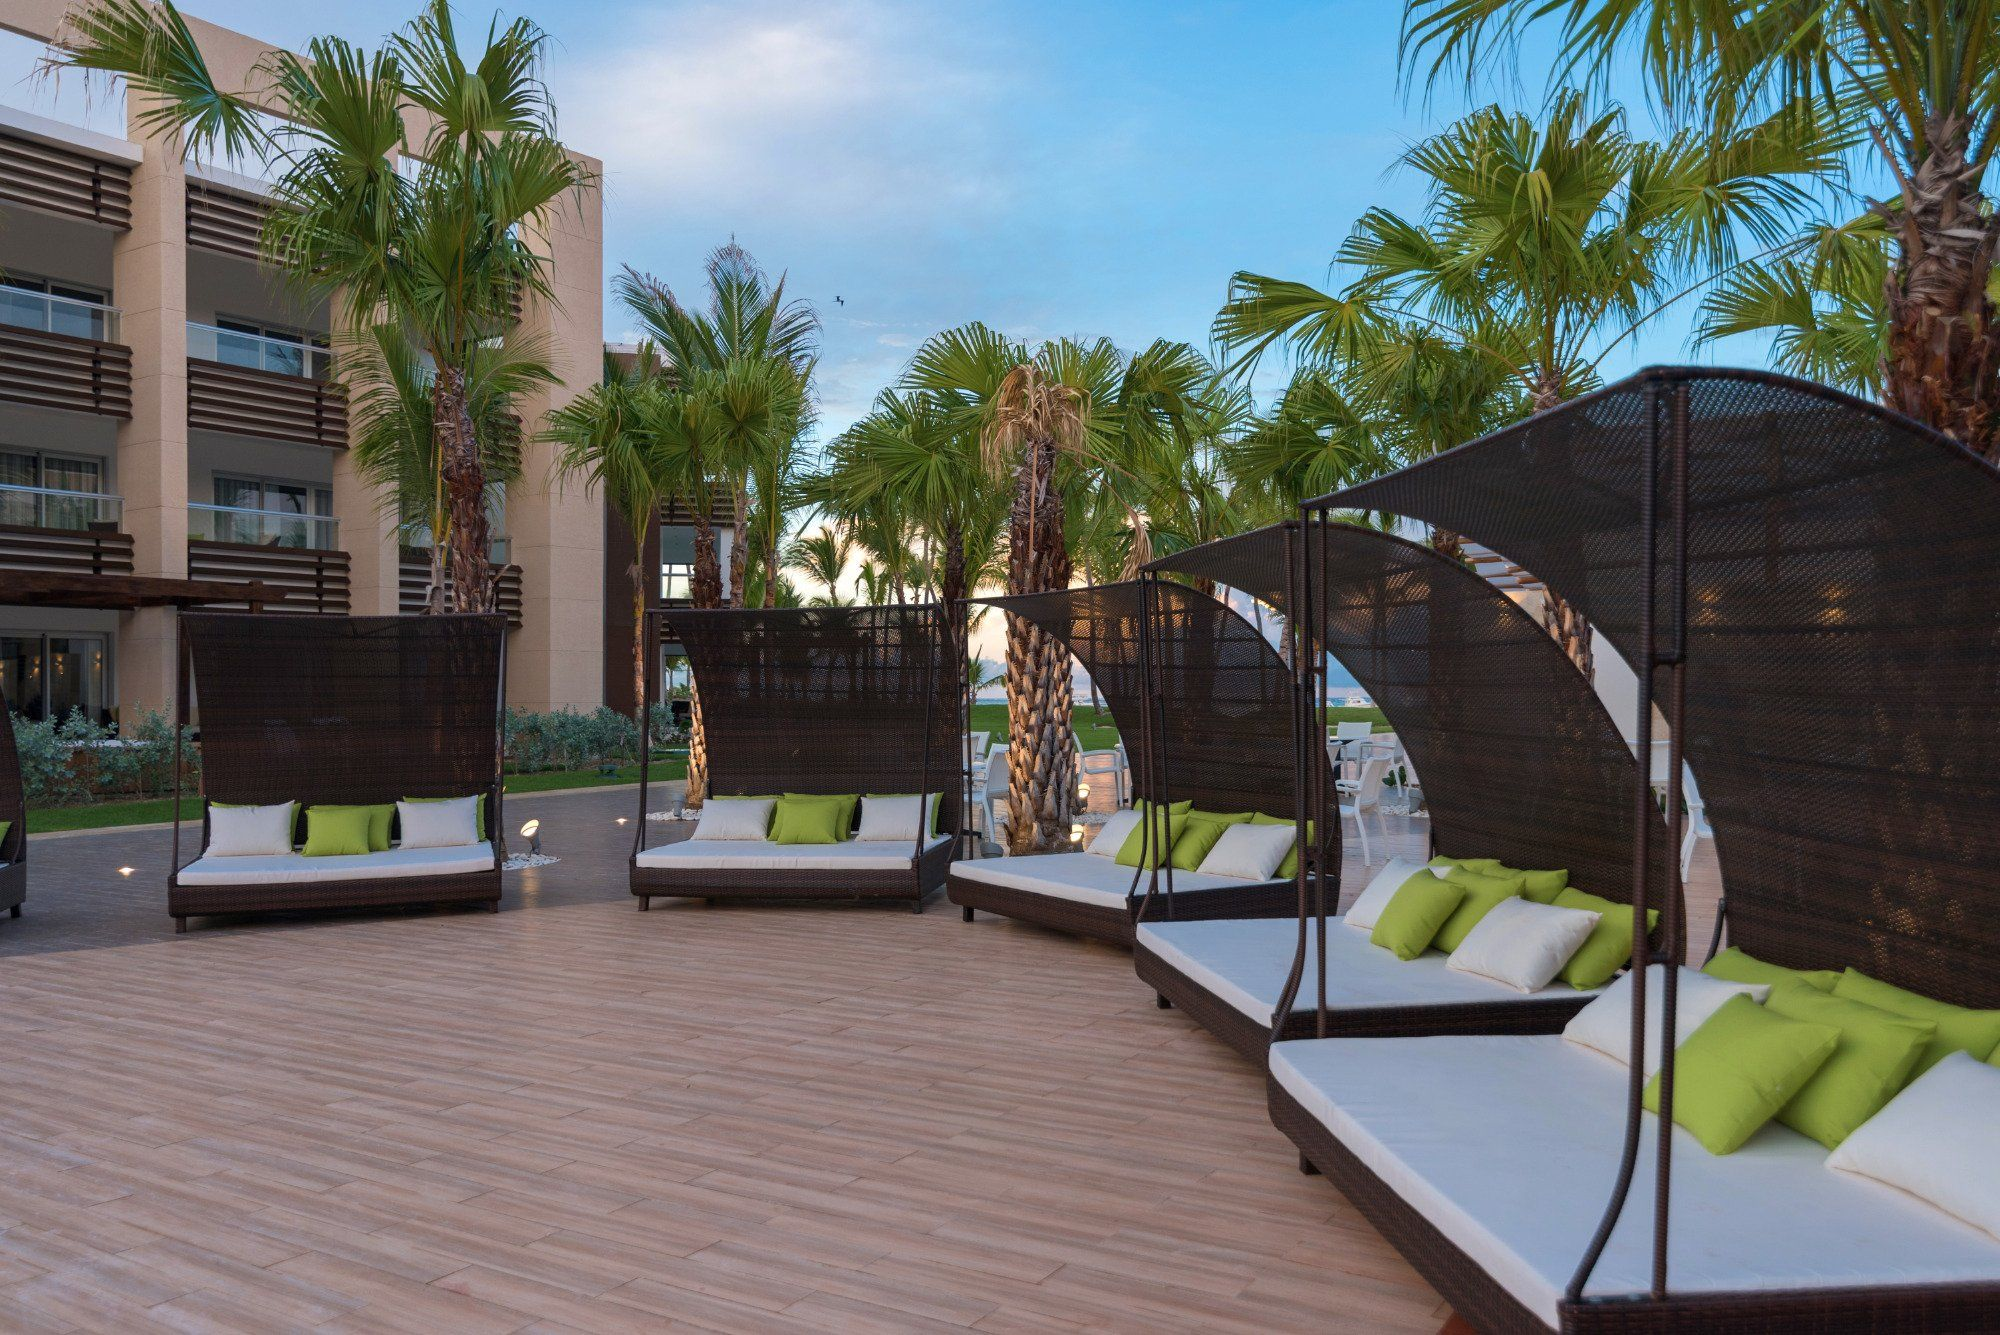 Bluebay Grand Punta Cana 143 5 3 8